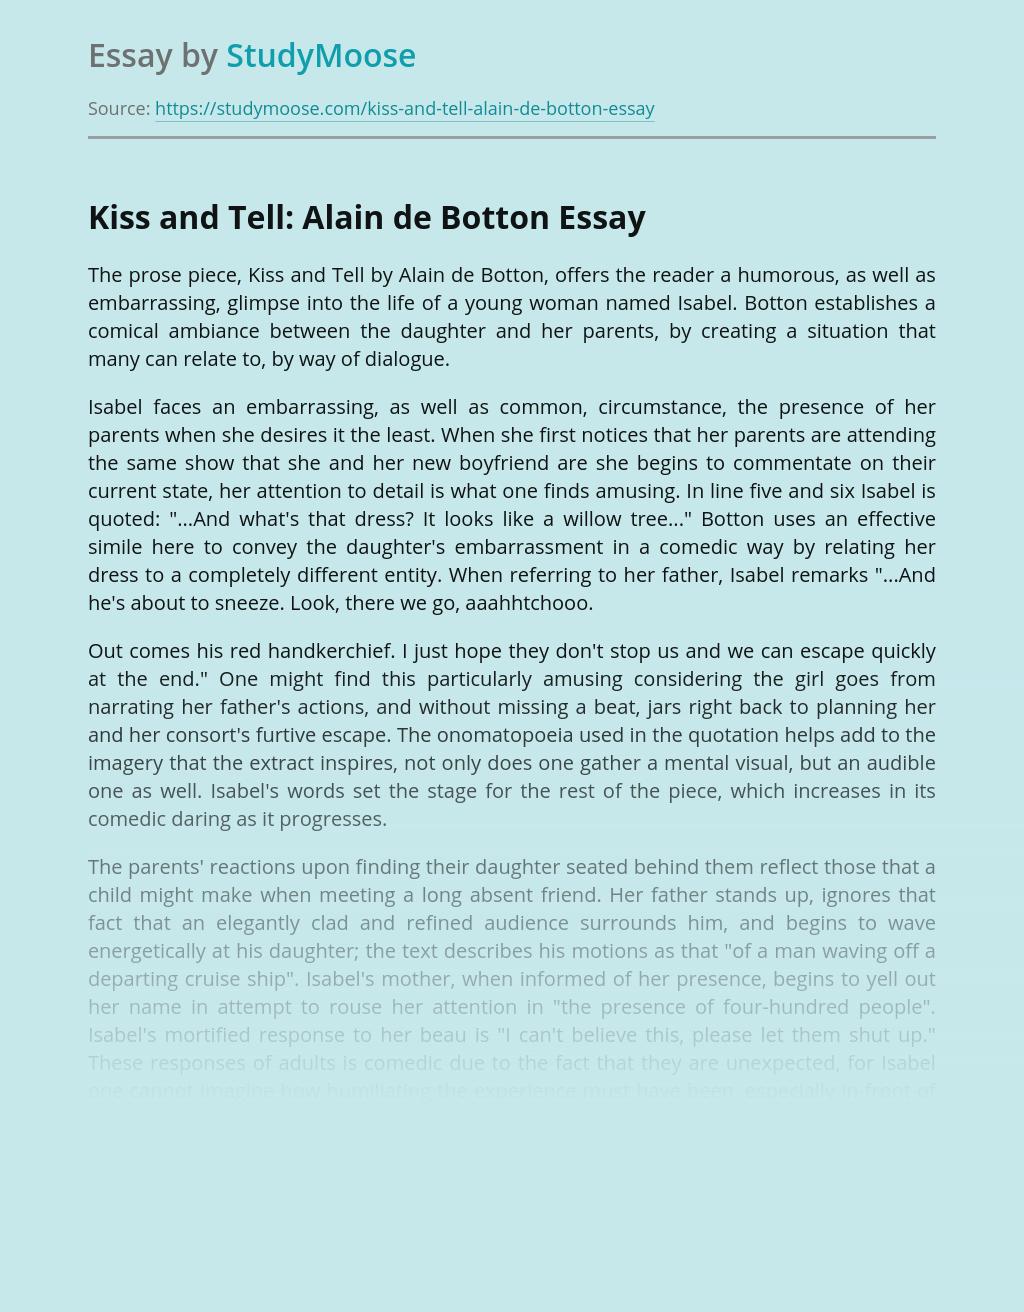 Kiss and Tell: Alain de Botton